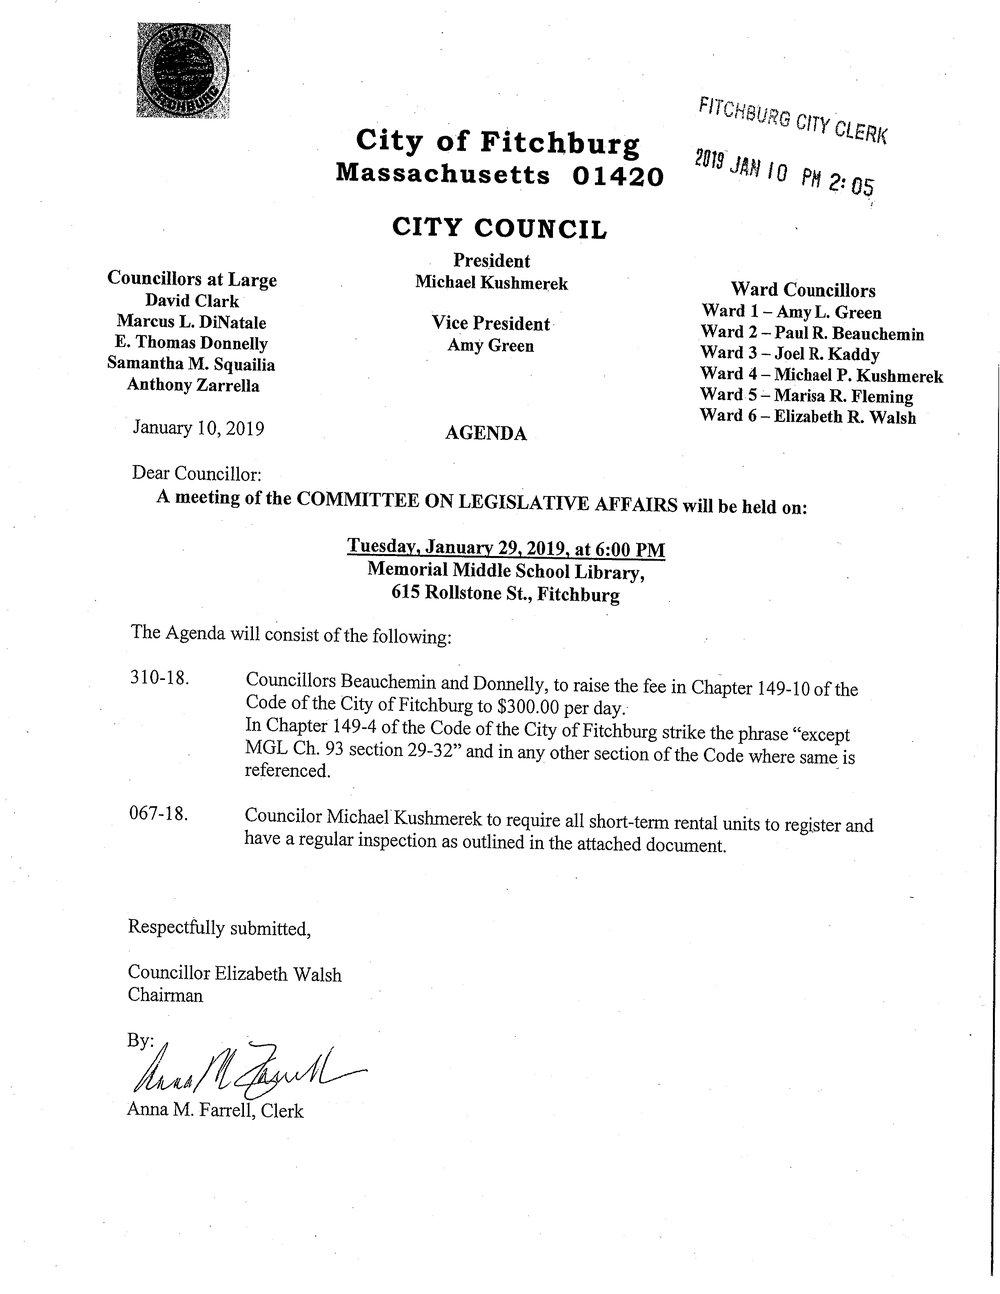 2019 1-29 Legislative_Affairs_Committee_Meeting_Agenda_001.jpg